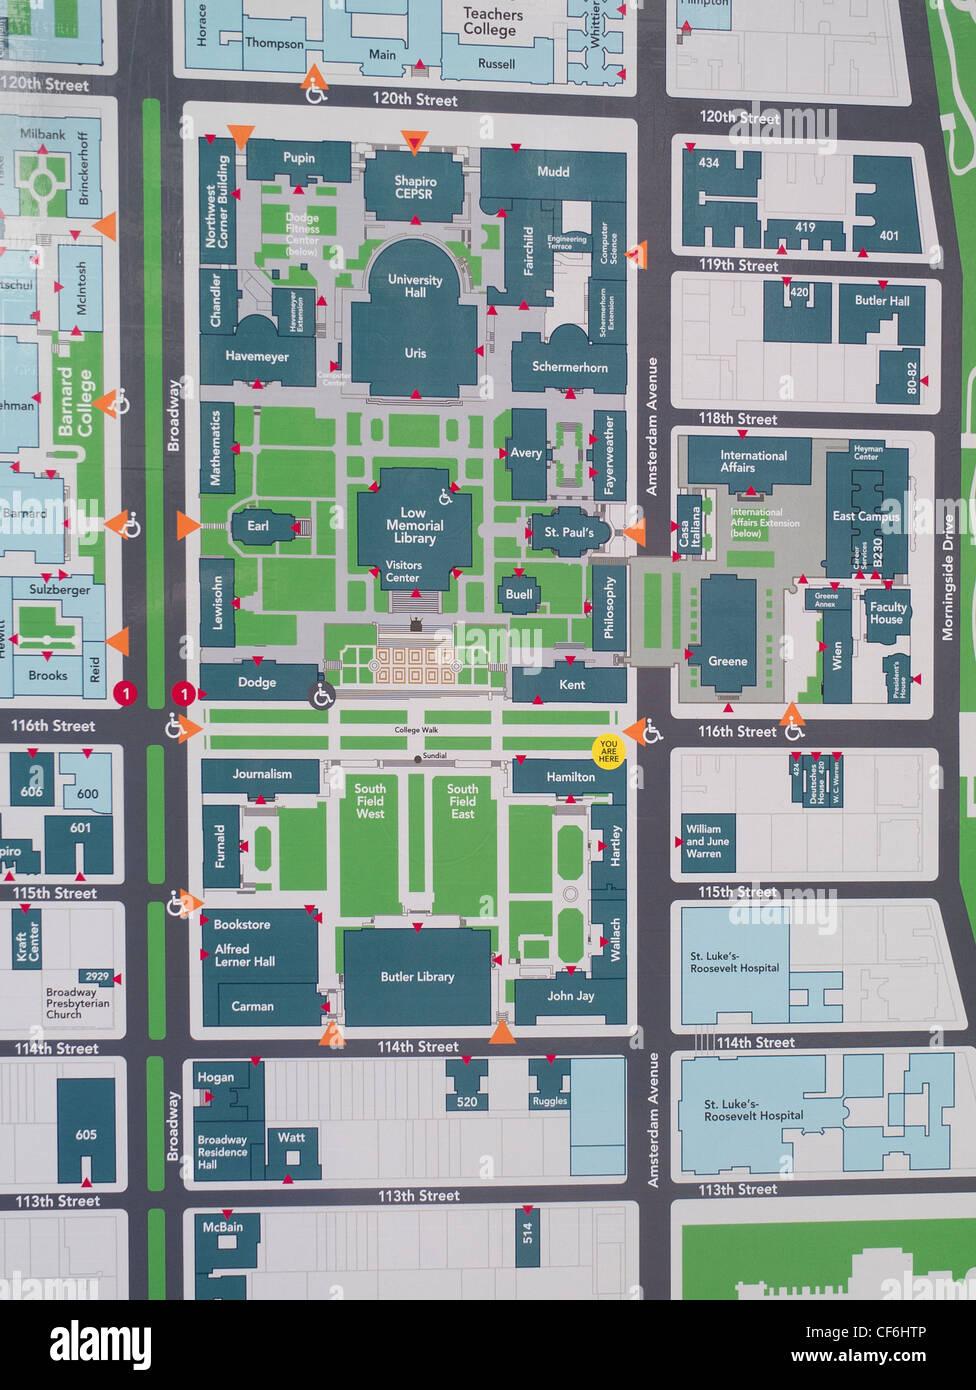 Campus Map Stockfotos & Campus Map Bilder - Alamy